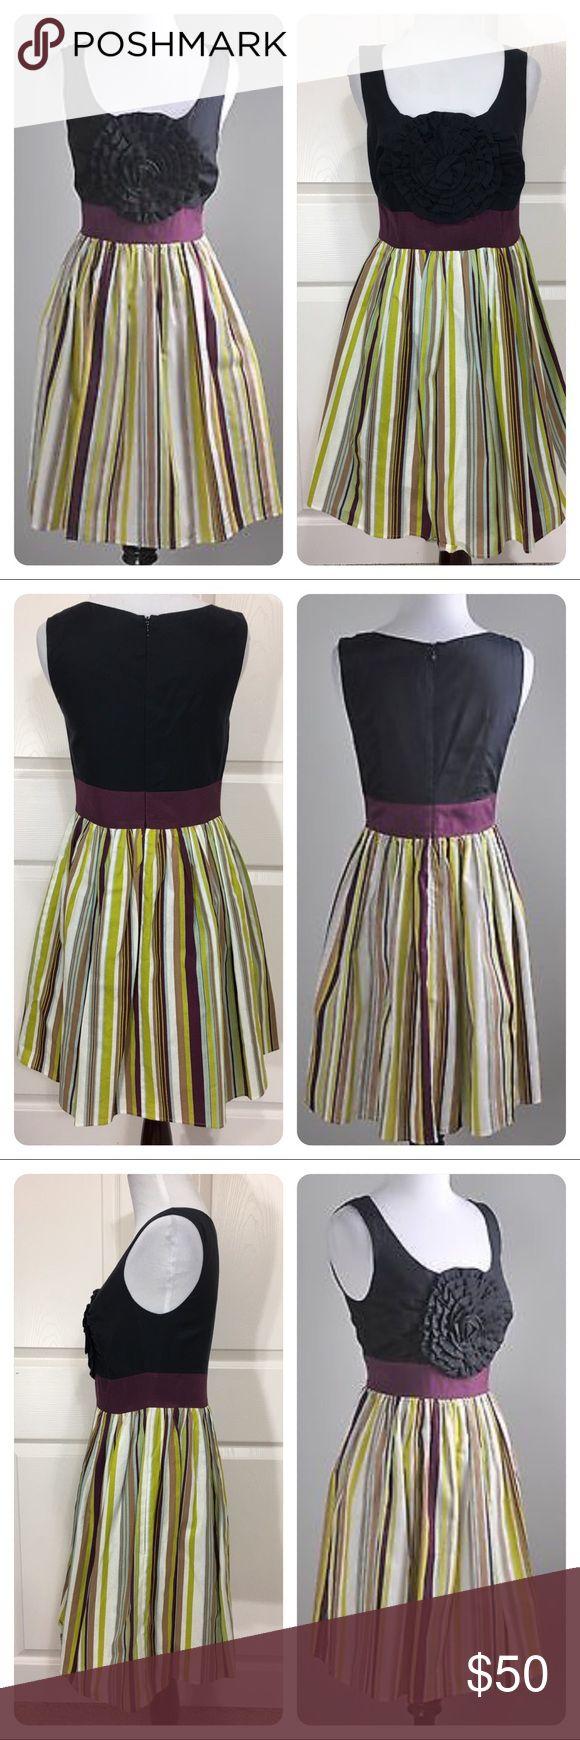 Anthropologie Burlap Rosette Dress Rare Burlap Rosette dress for Anthropologie. Dramatic Rosette on front of bodice. Figure flattering vertical stripes on skirt. Great dress for all occasions! No flaws noted. Anthropologie Dresses